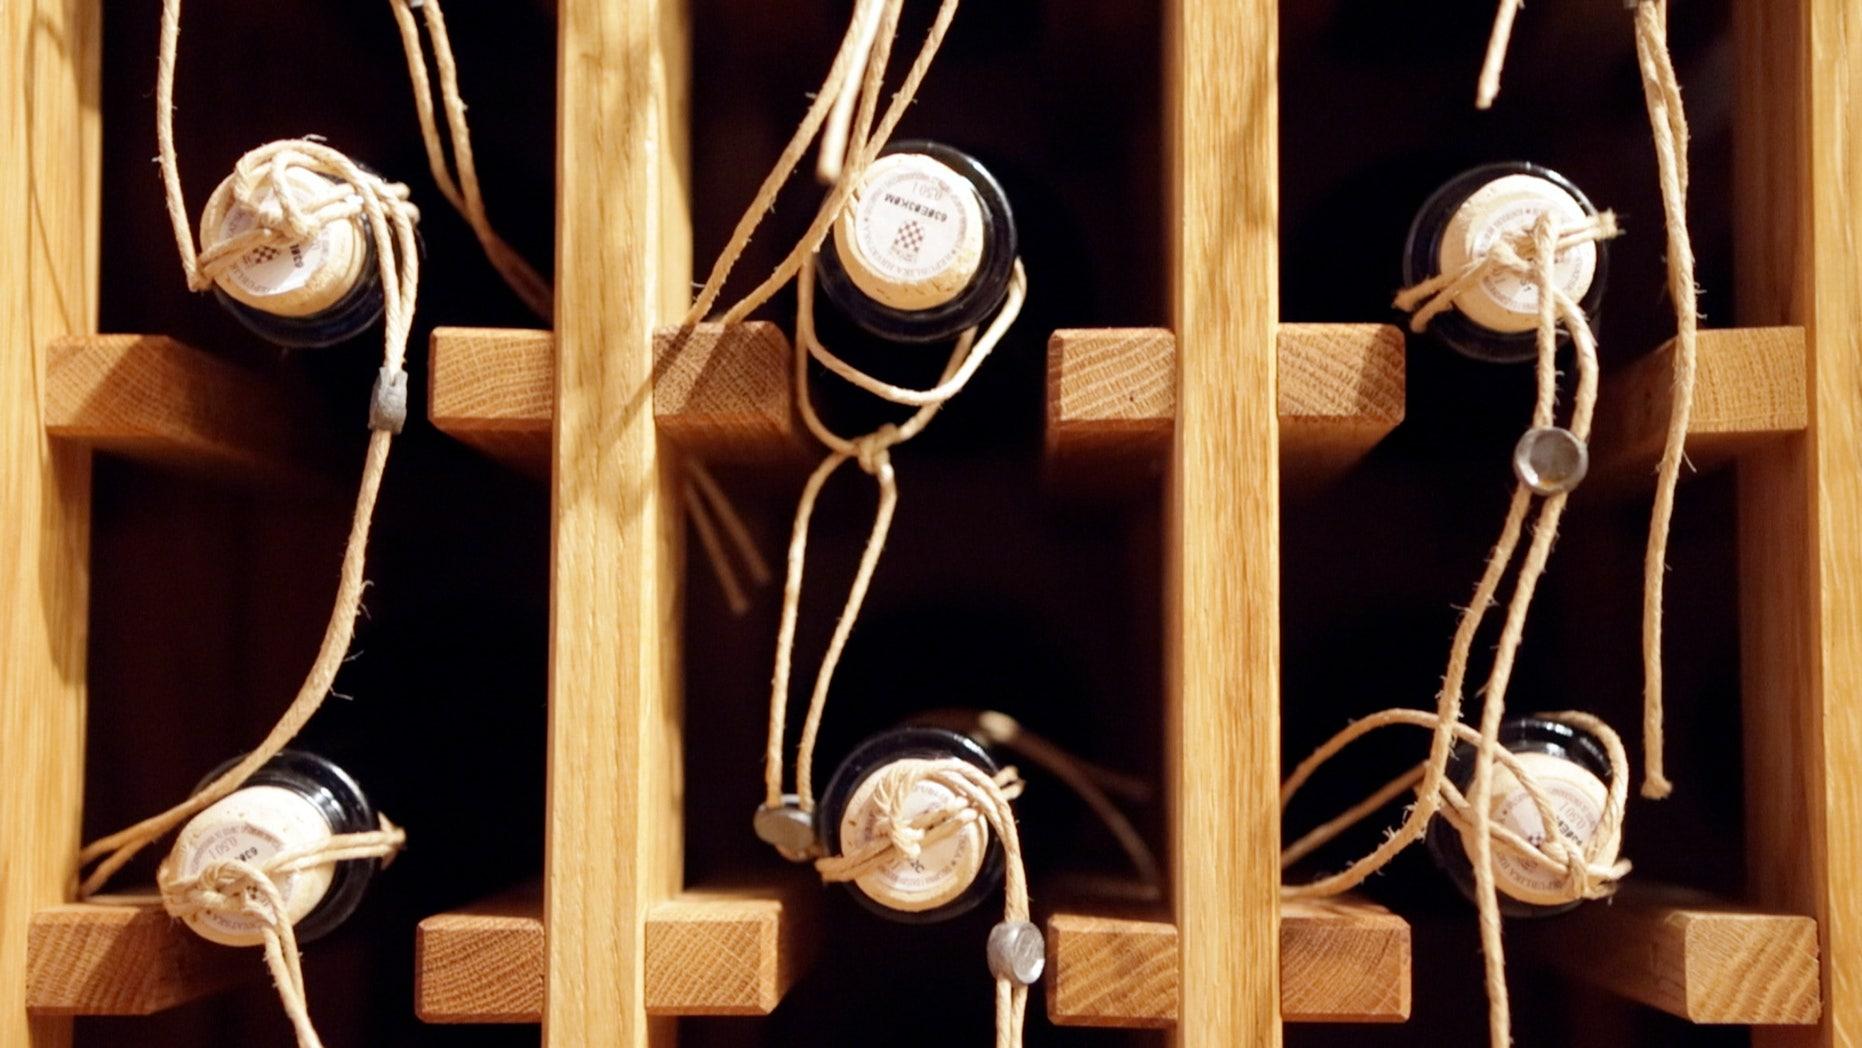 April 27, 2013: Bbottles of local made sweet wine Prosek are seen on a shelf in a wine cellar in Jelsa, southern Croatia.